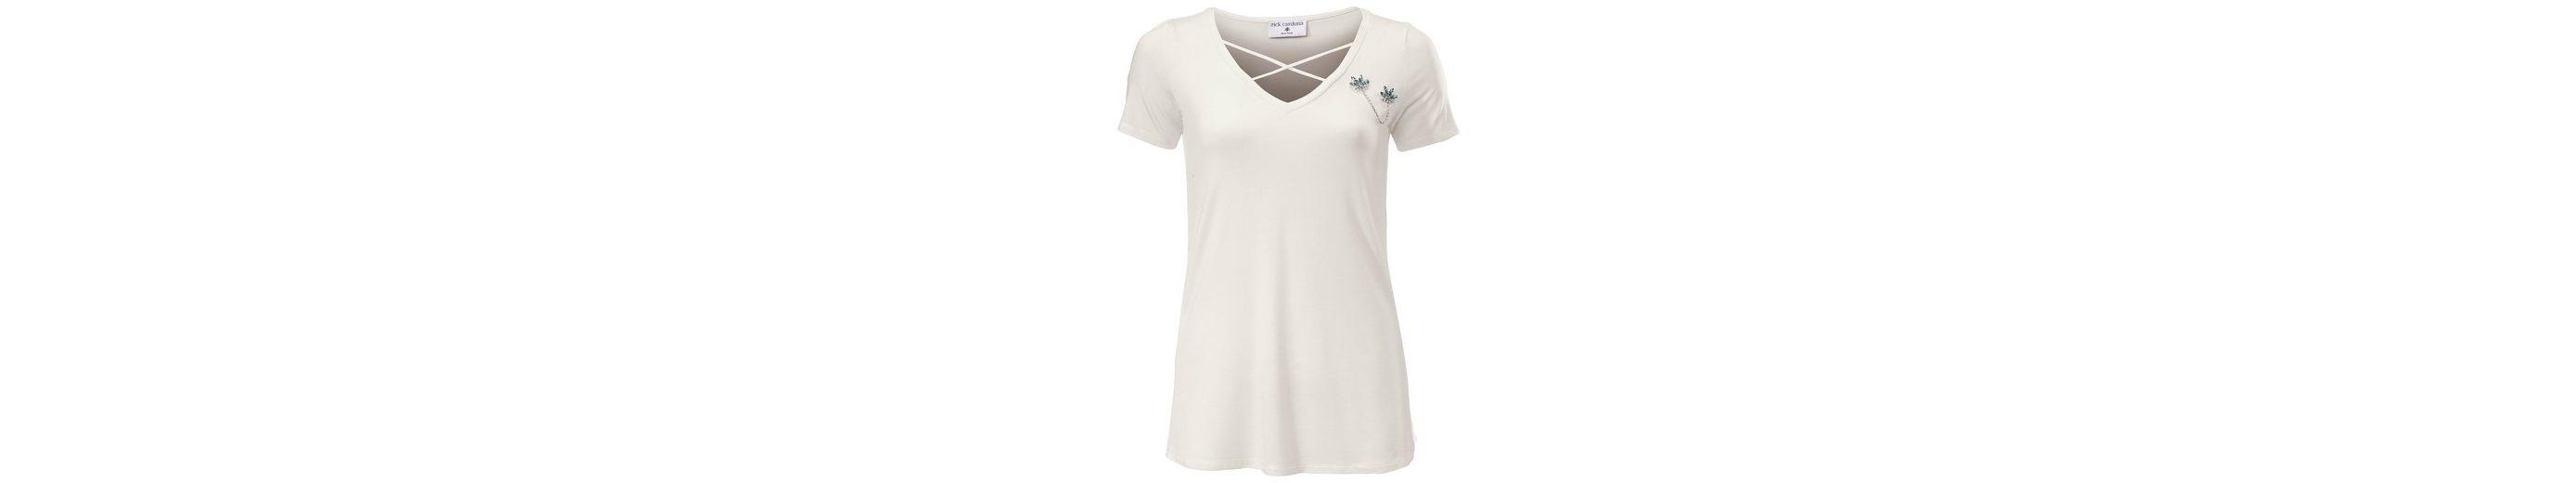 Neuester Rabatt Billig Verkaufen Brandneue Unisex RICK CARDONA by Heine V-Shirt mit Schmuckelementen Rabatt Aaa RLT60p4Are